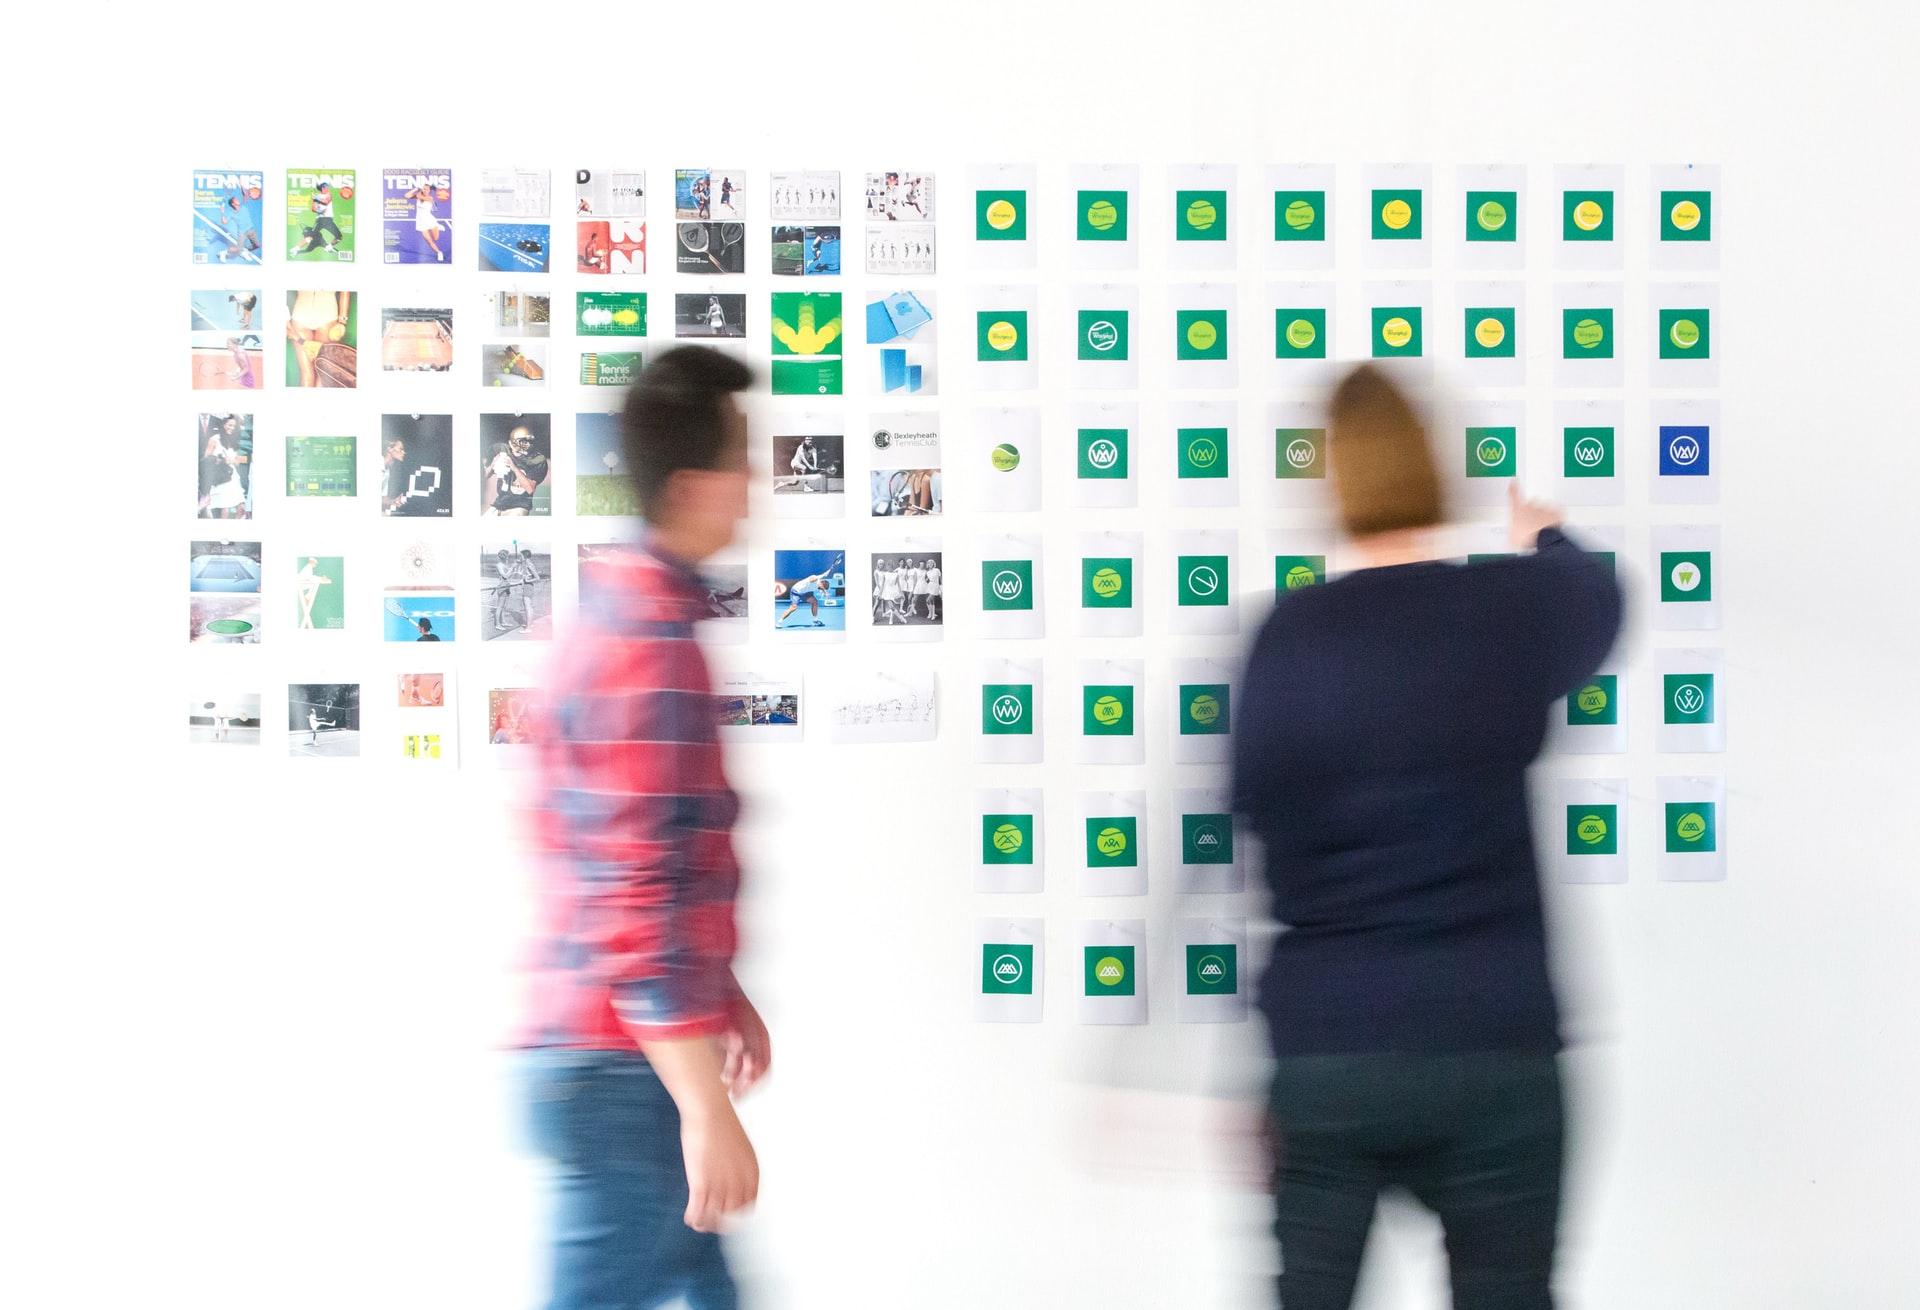 Brainstorming brand ideas